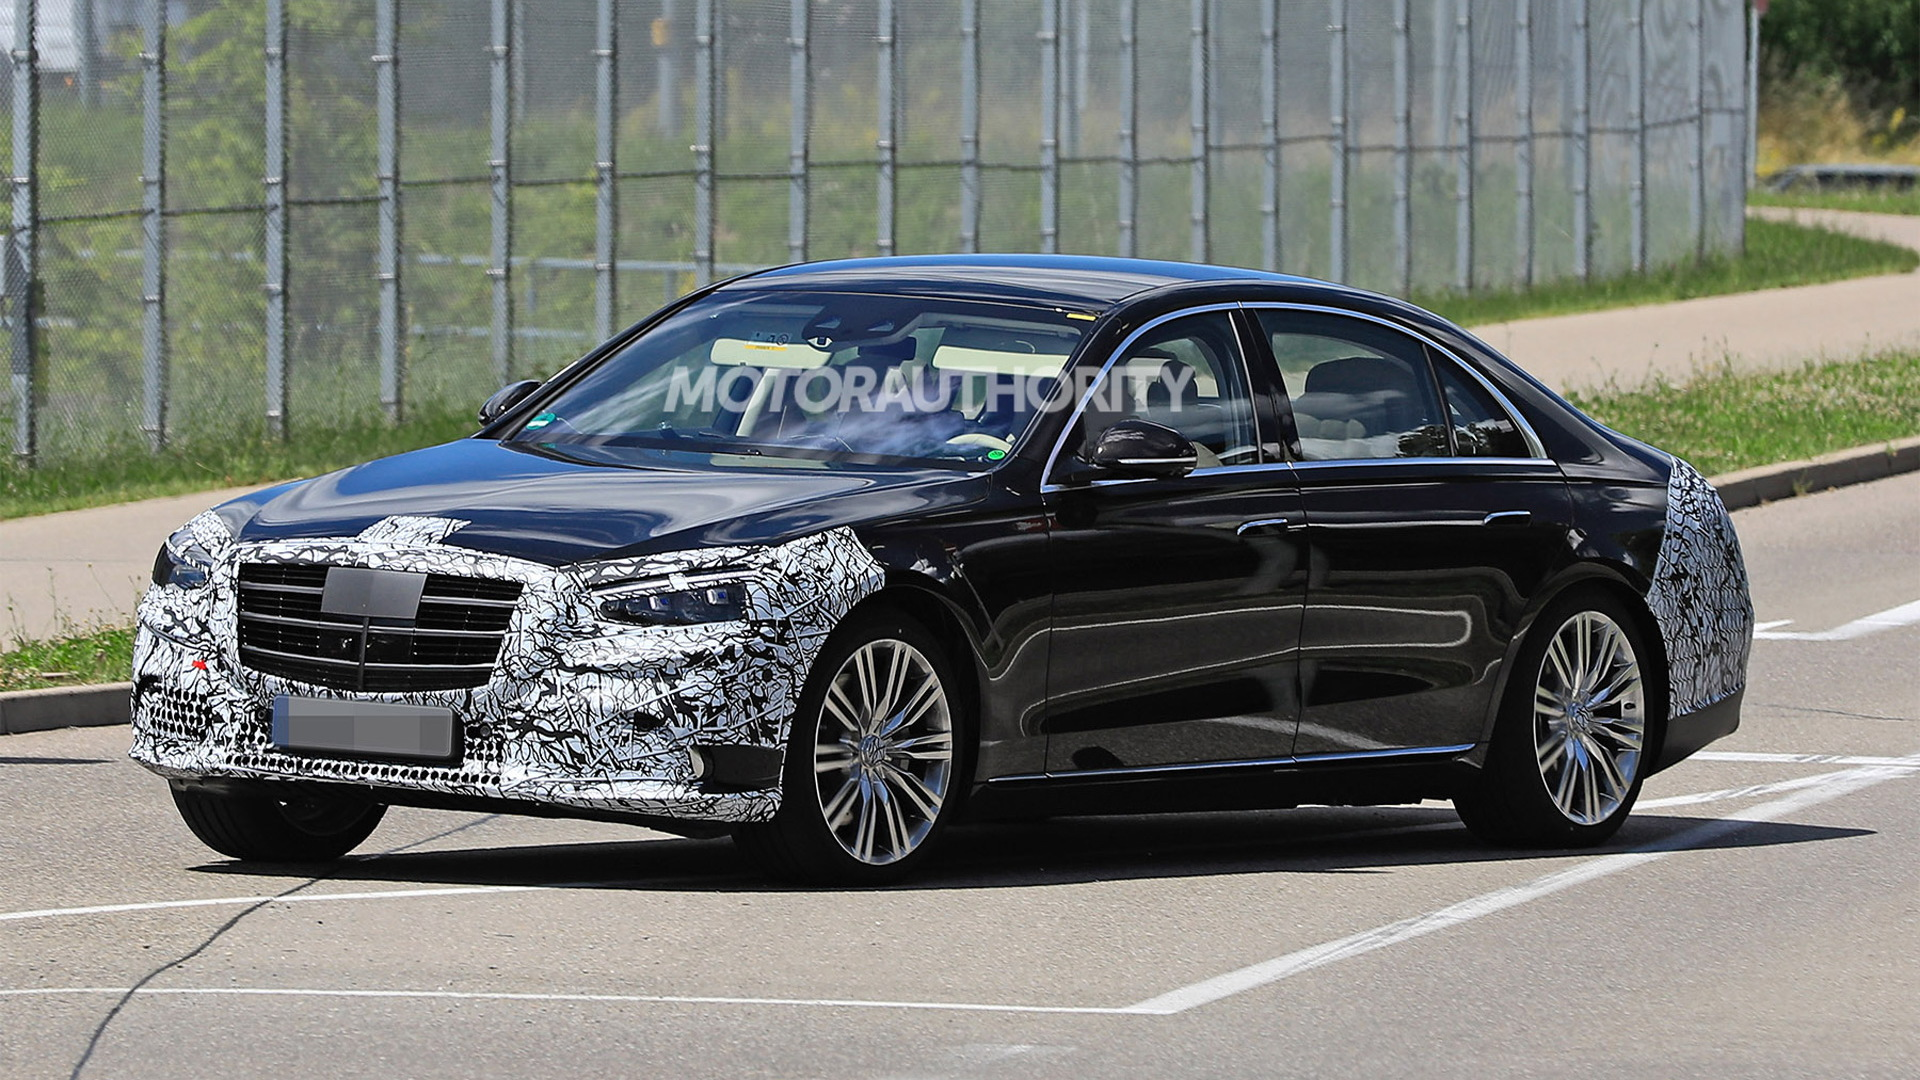 2021 Mercedes-Benz S-Class spy shots - Photo credit:S. Baldauf/SB-Medien